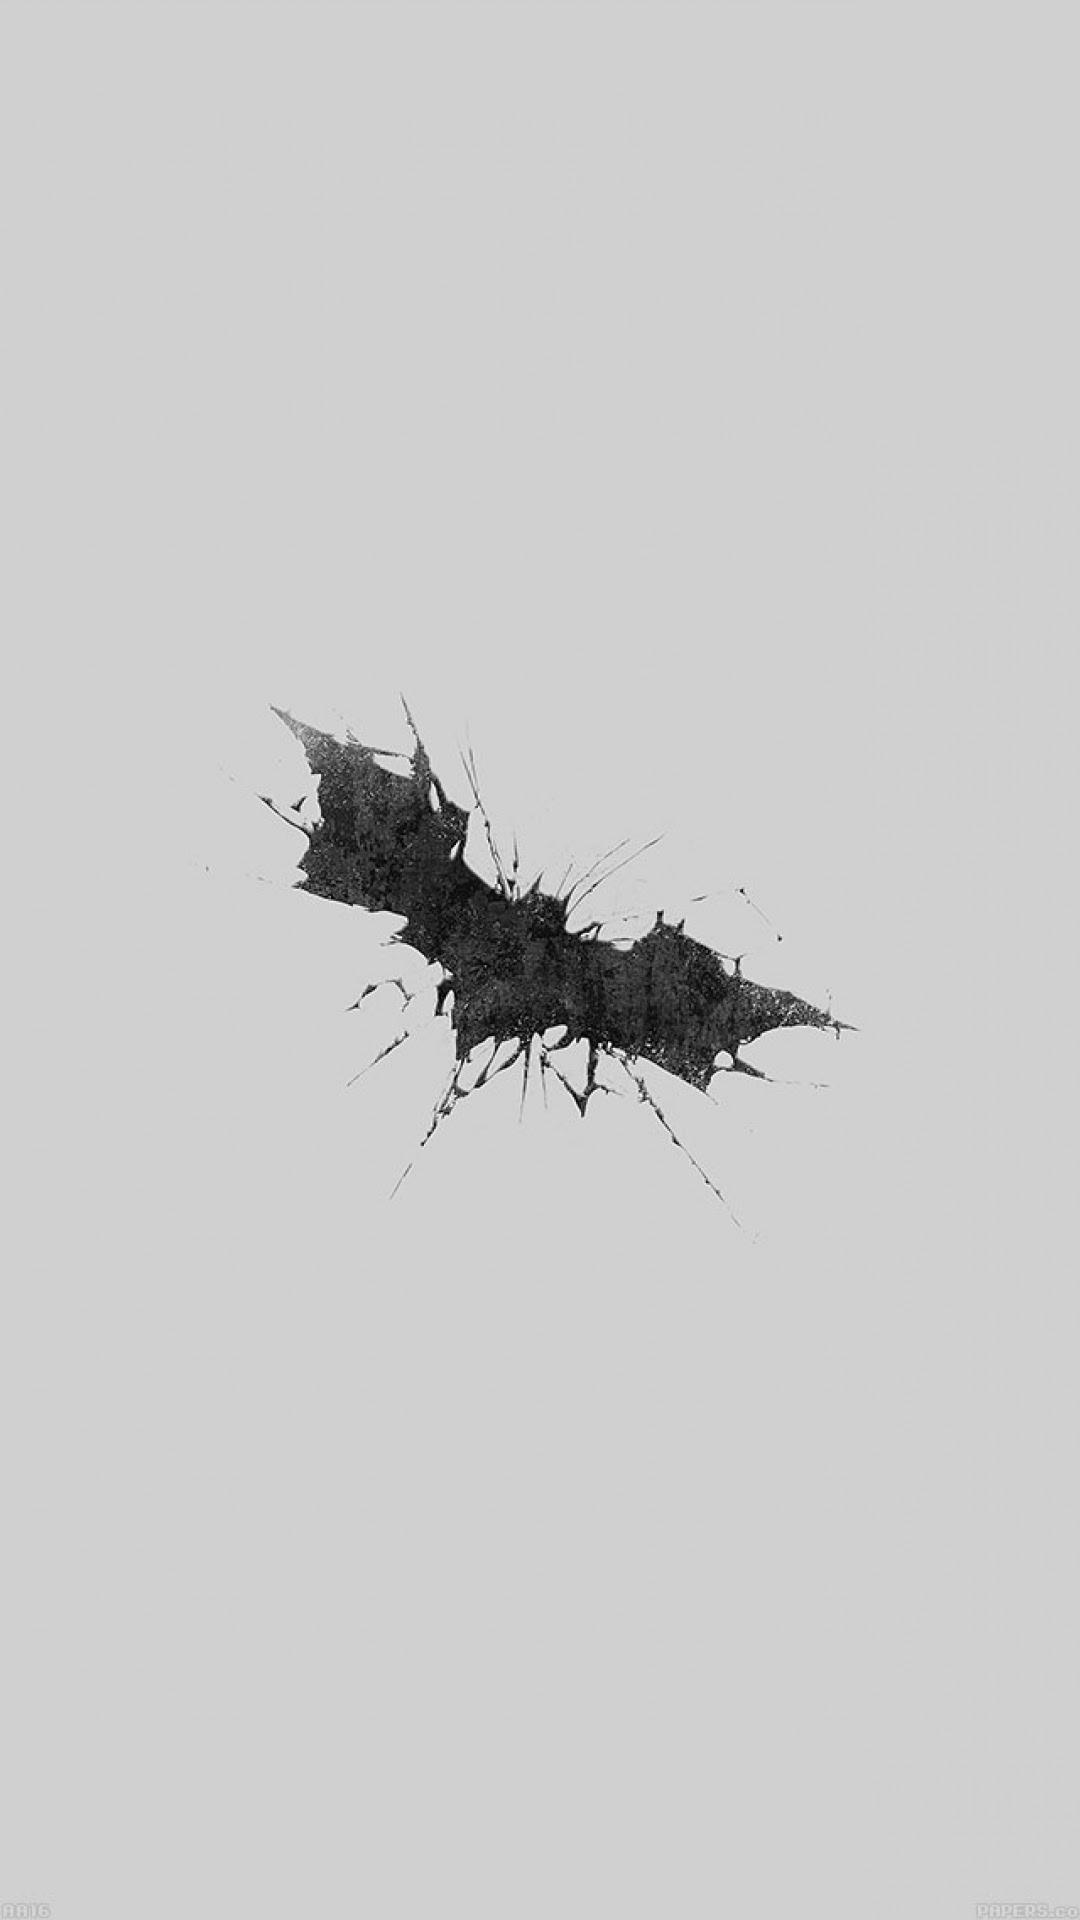 Tokyo Ghoul Wallpaper Hd Batman Logo Iphone Wallpapers Pixelstalk Net